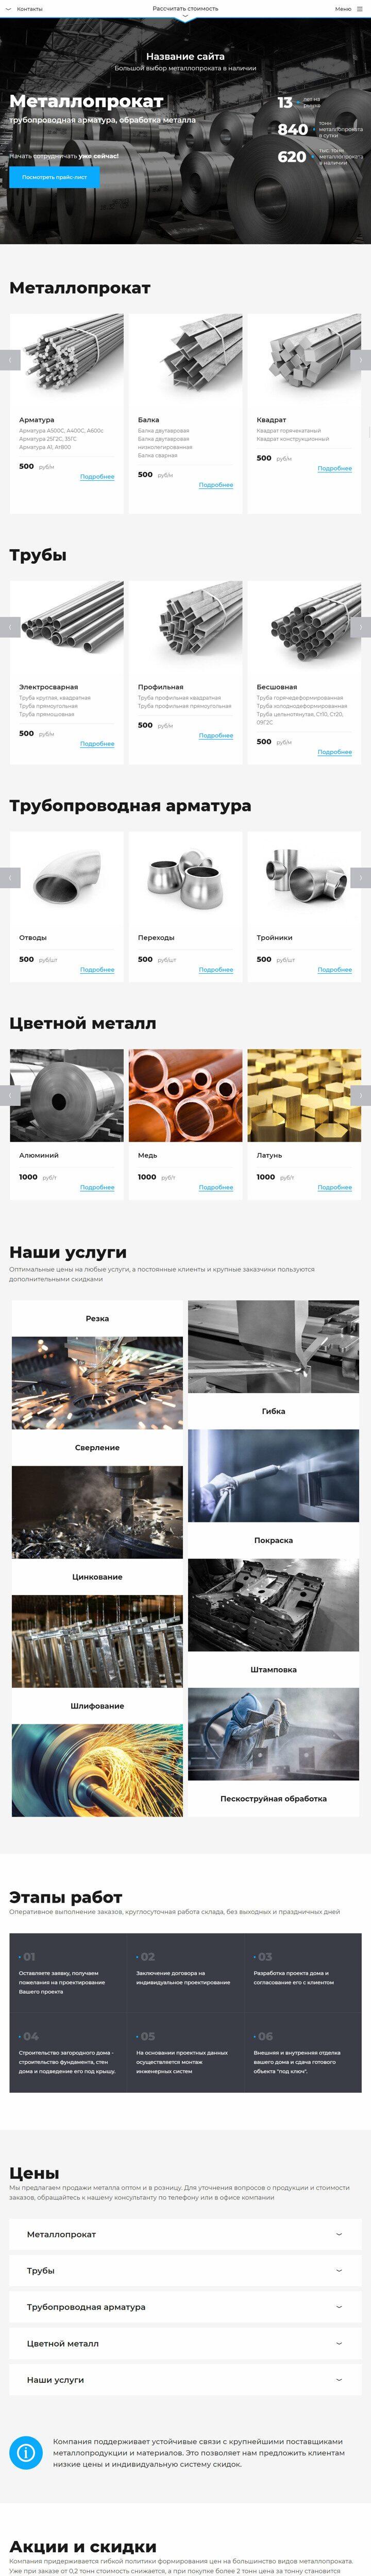 Готовый Сайт-Бизнес #2842950 - Металлопрокат, арматура (Главная 1)